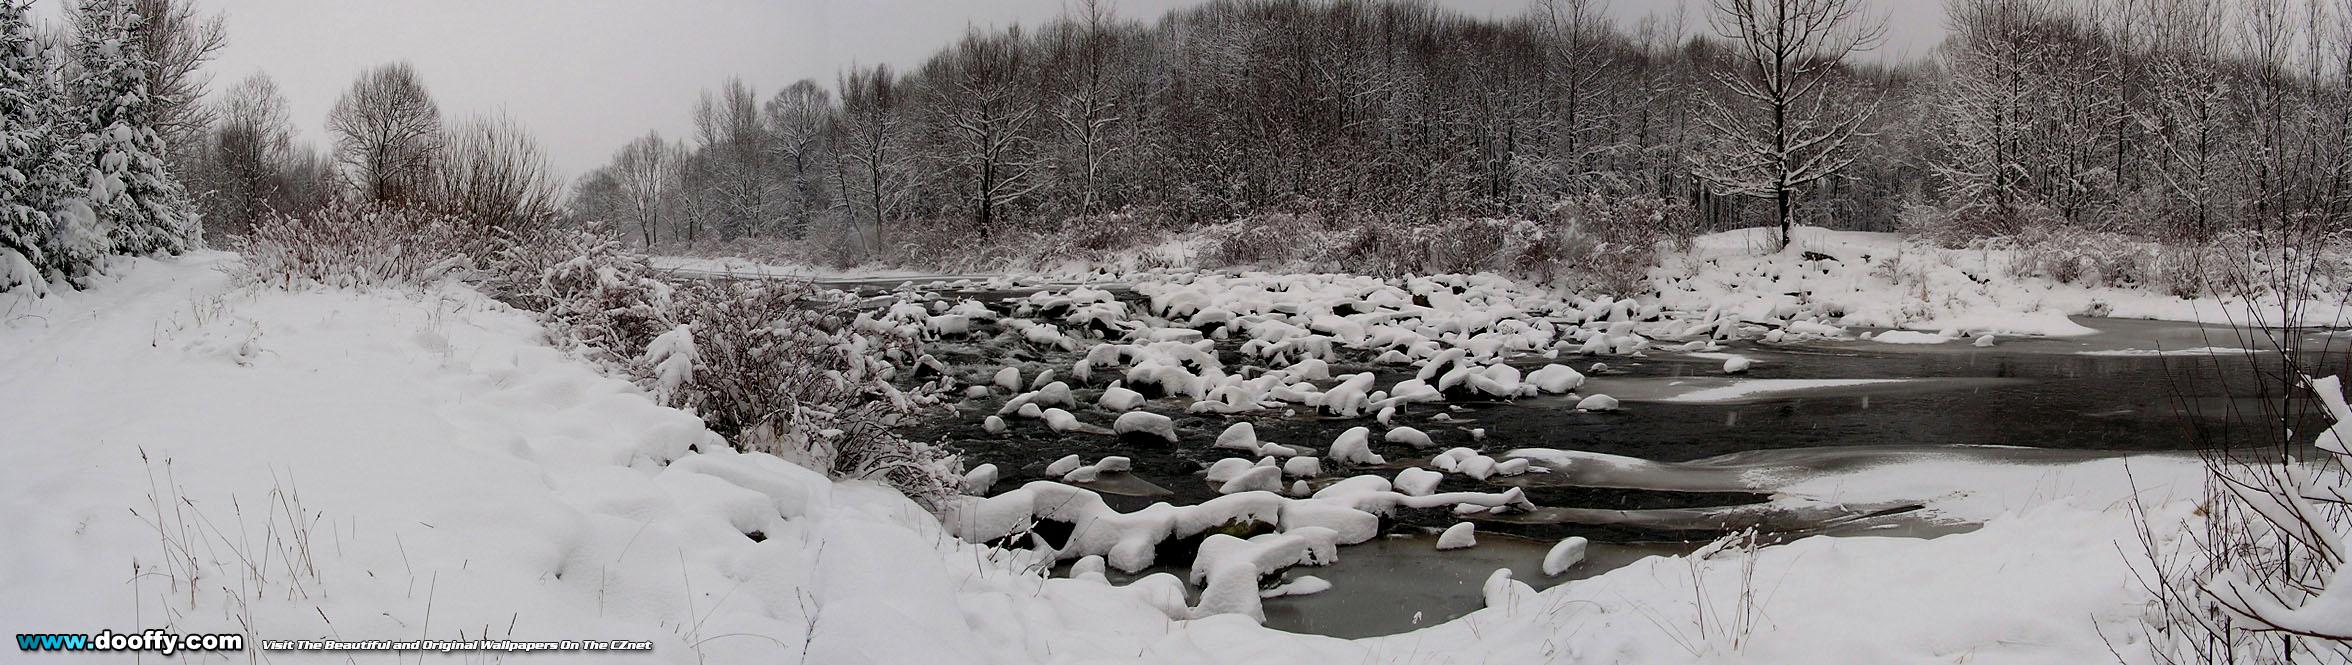 River - Ostravice